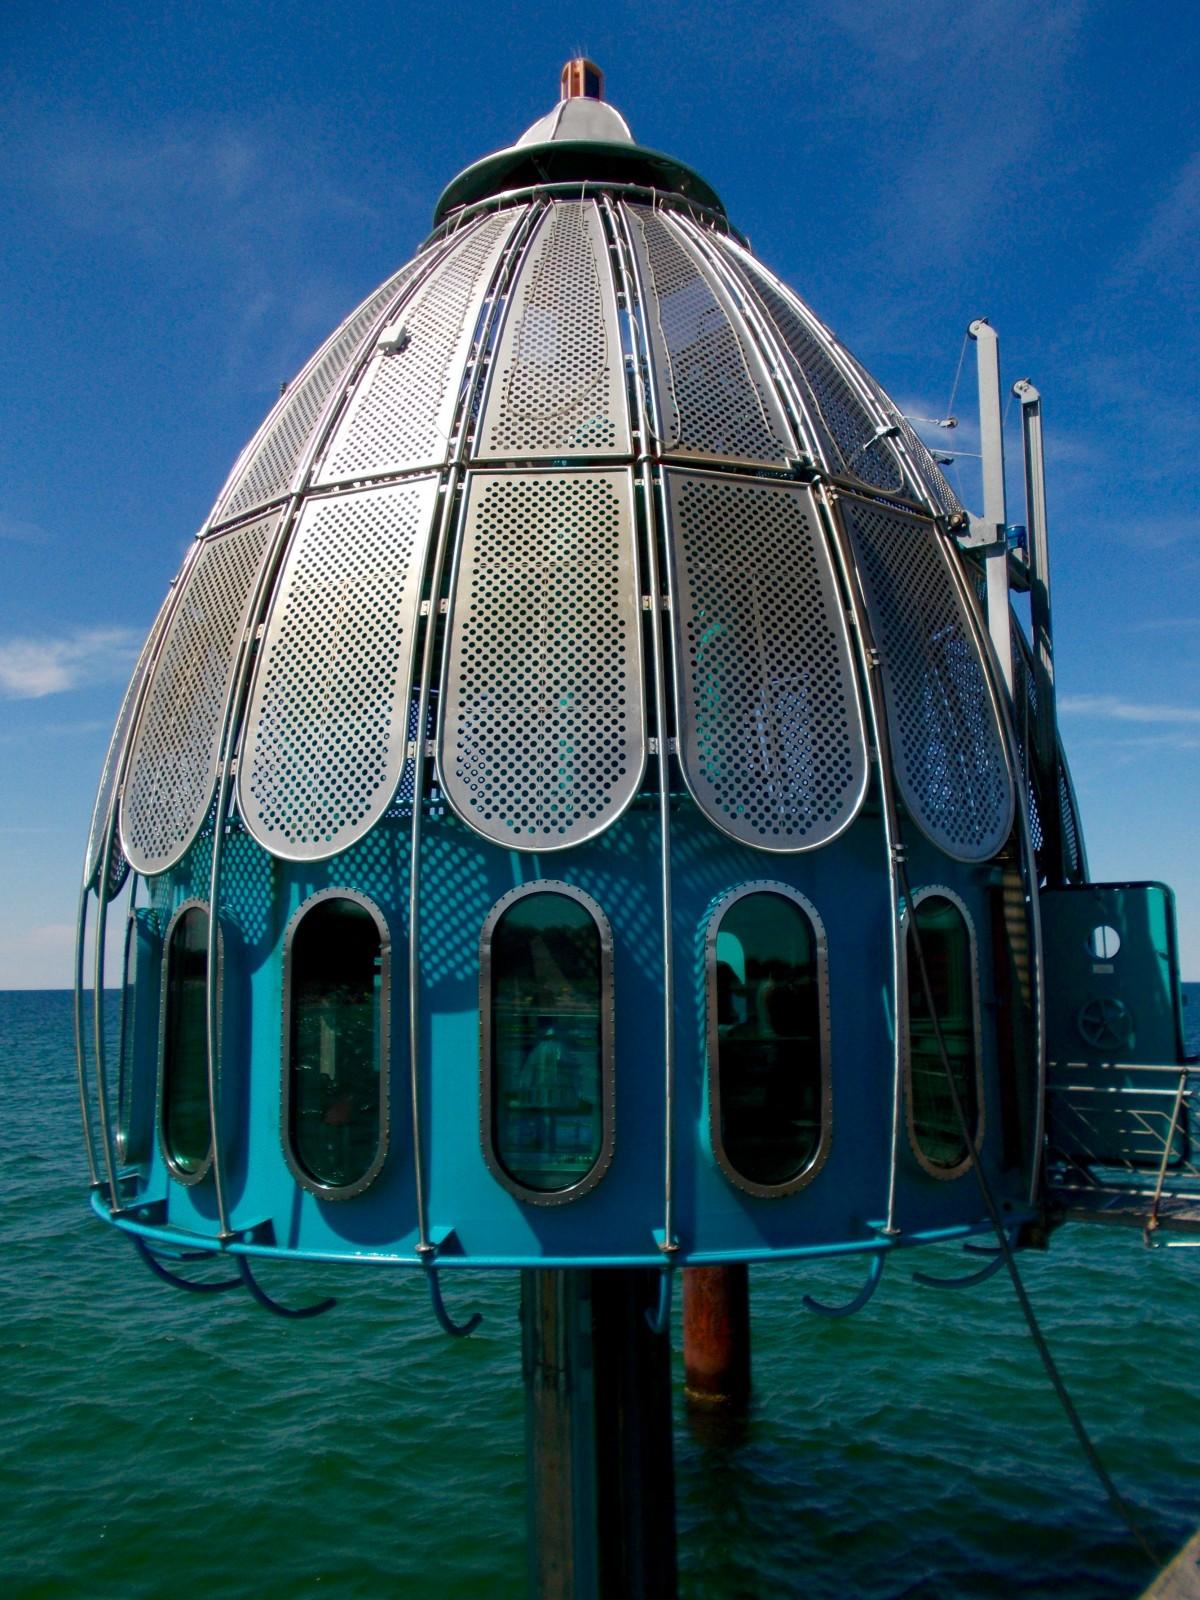 Free Images : technology, drum, submarine, tourist ...